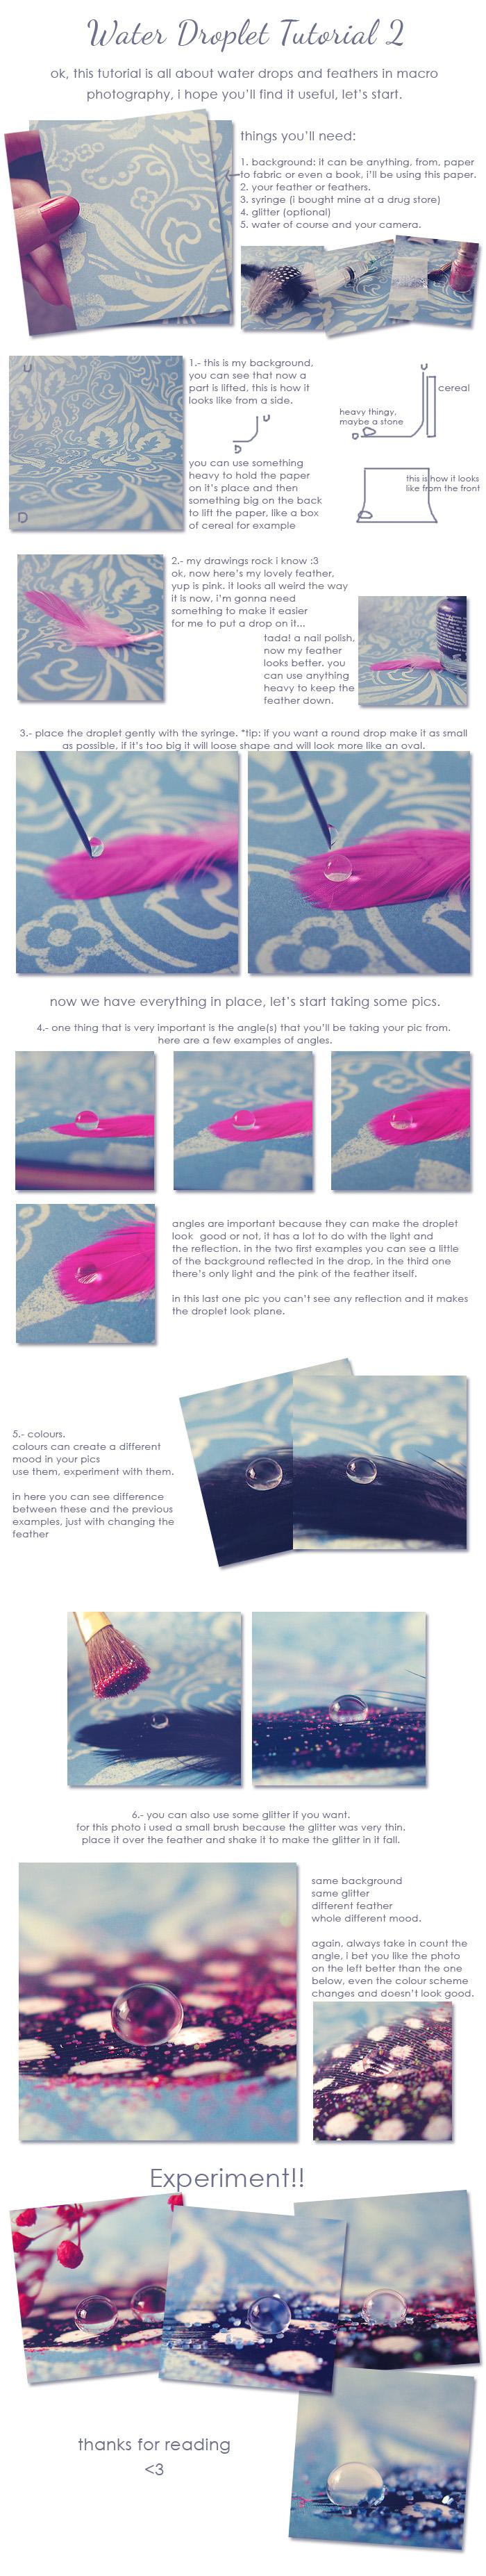 water droplet tutorial 2 by unread-story